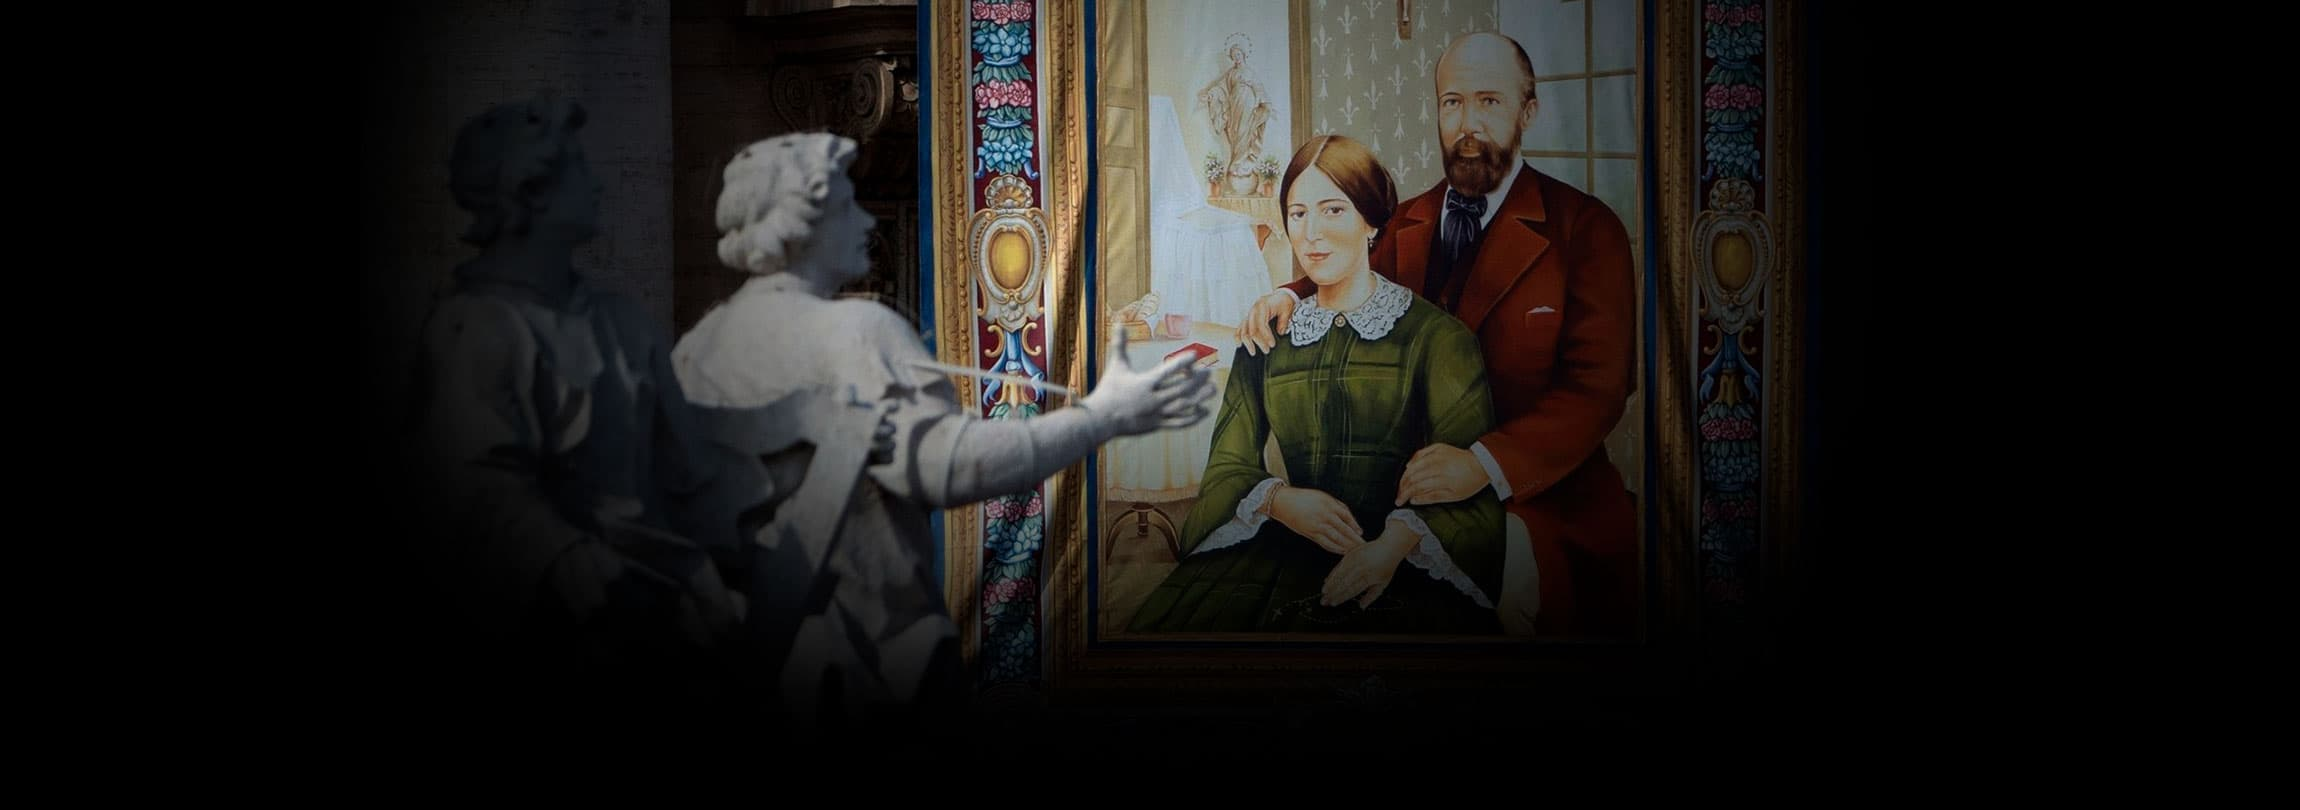 A indissolubilidade do Matrimônio, reflexo do amor total de Cristo